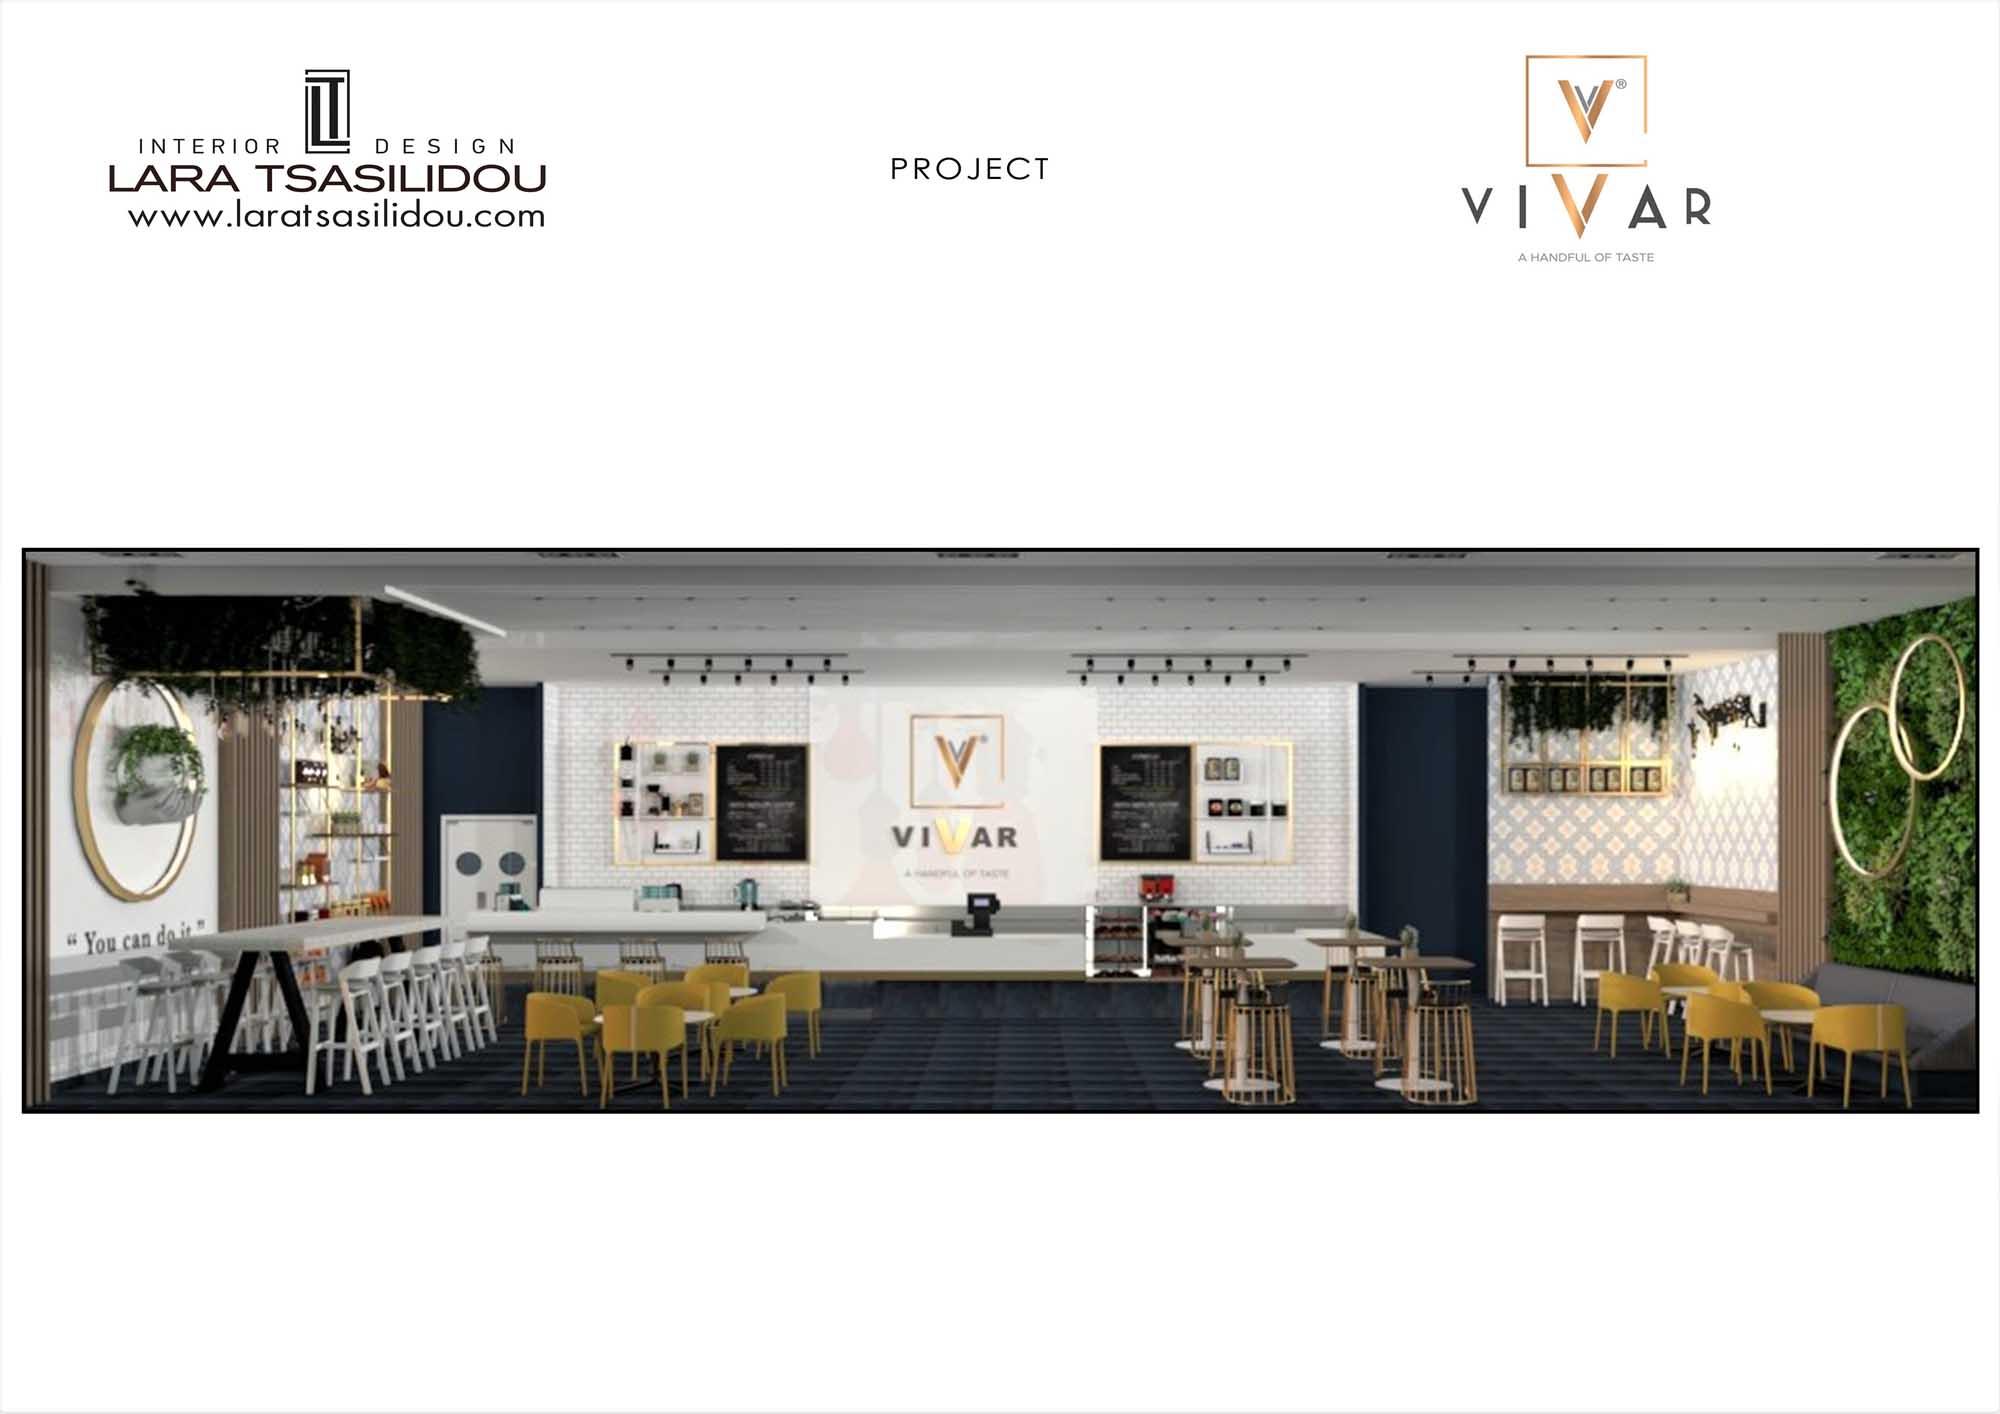 Vivar-2